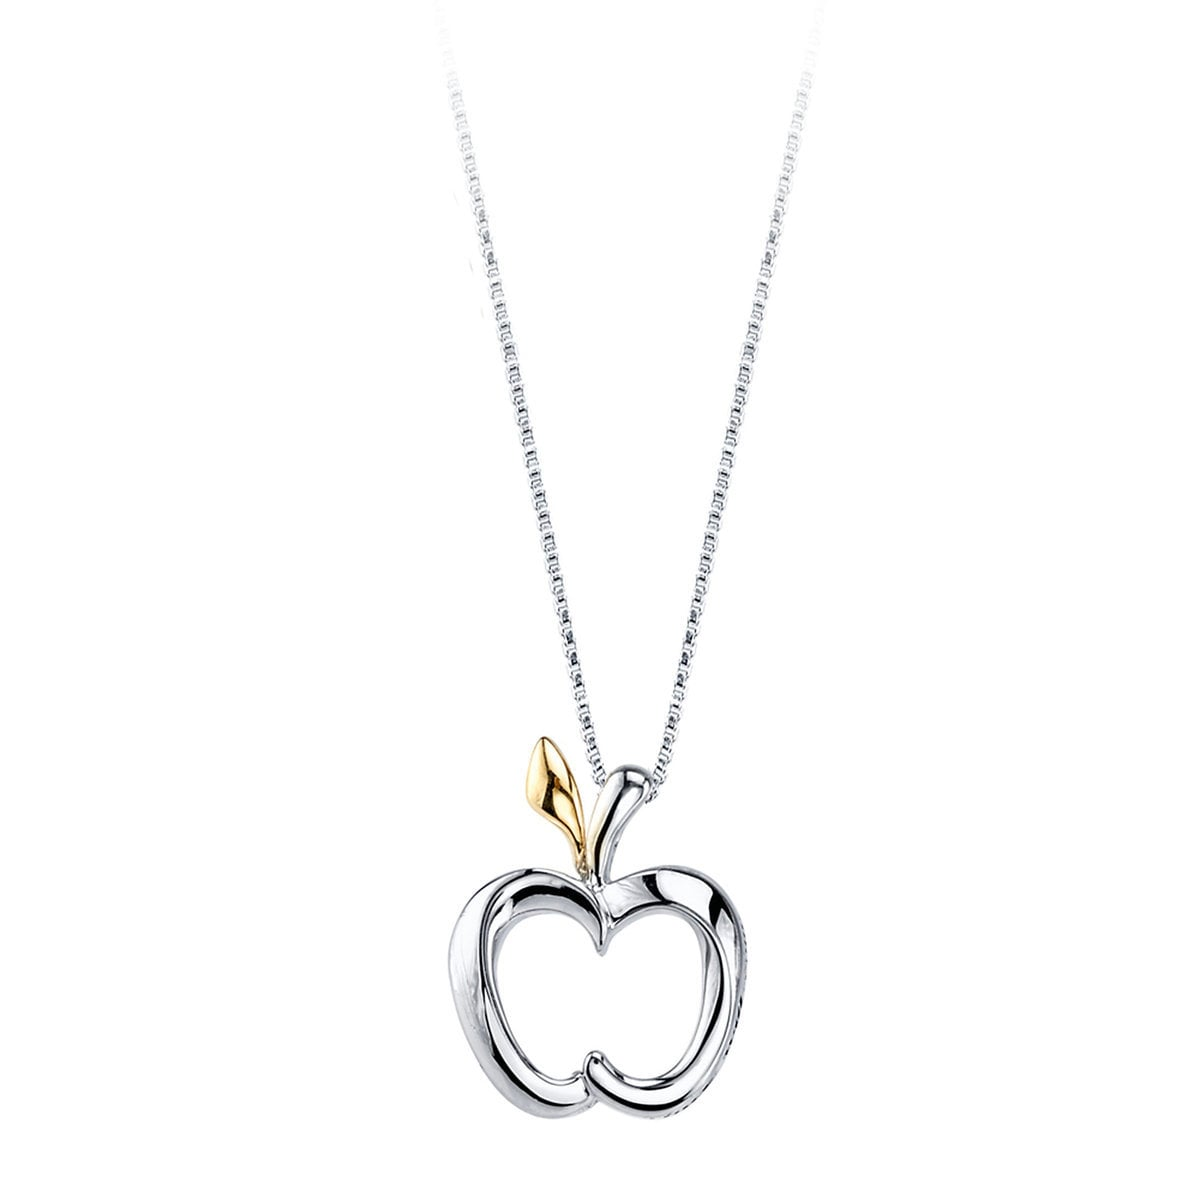 Snow white apple necklace for women shopdisney snow white apple necklace for women aloadofball Choice Image